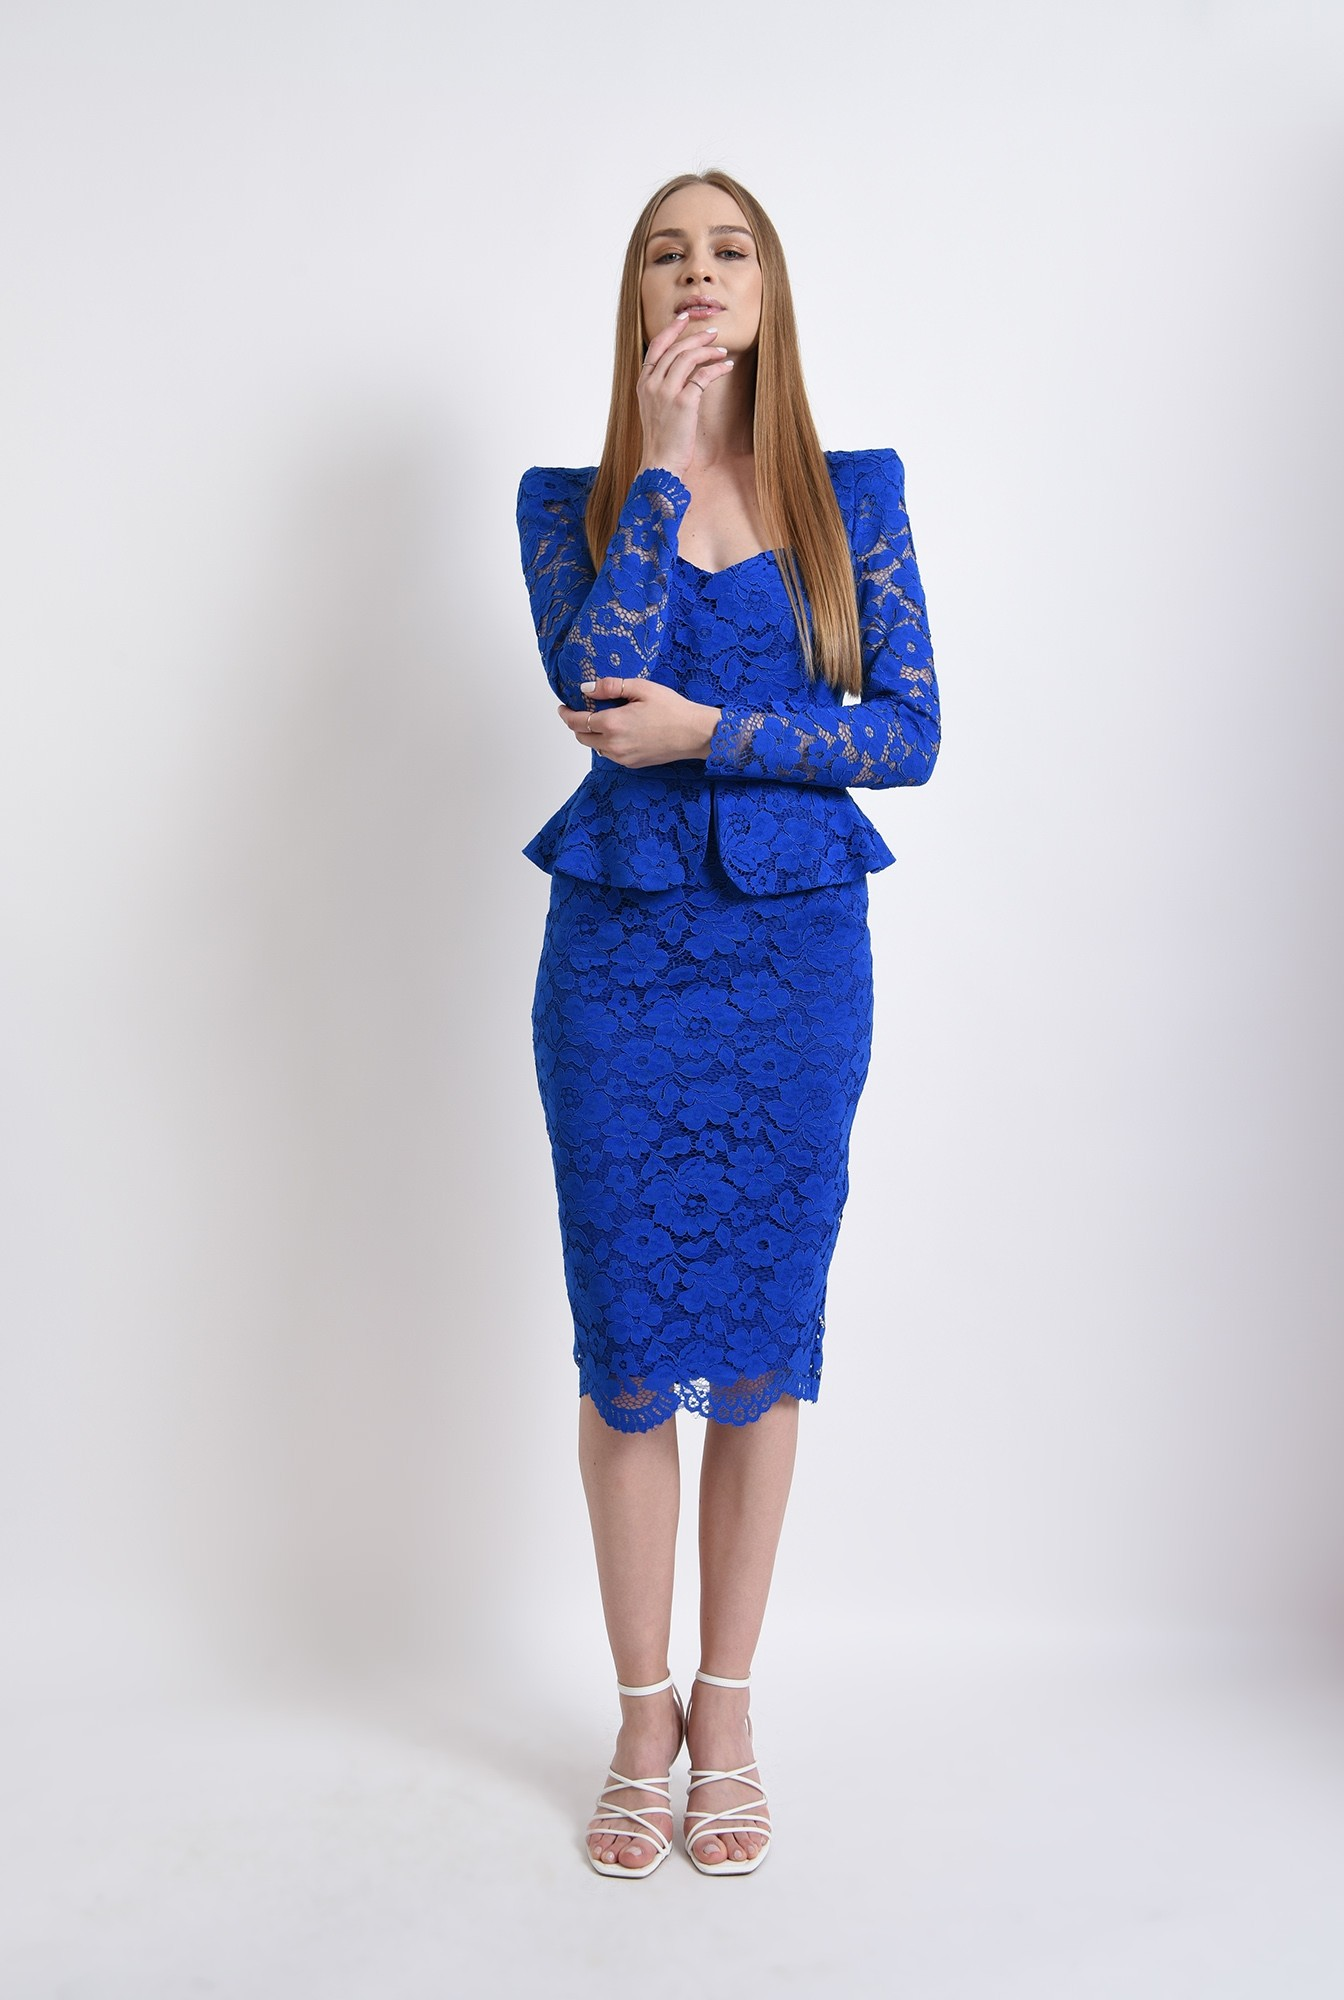 0 - 360 - rochie albastra, eleganta, din dantela